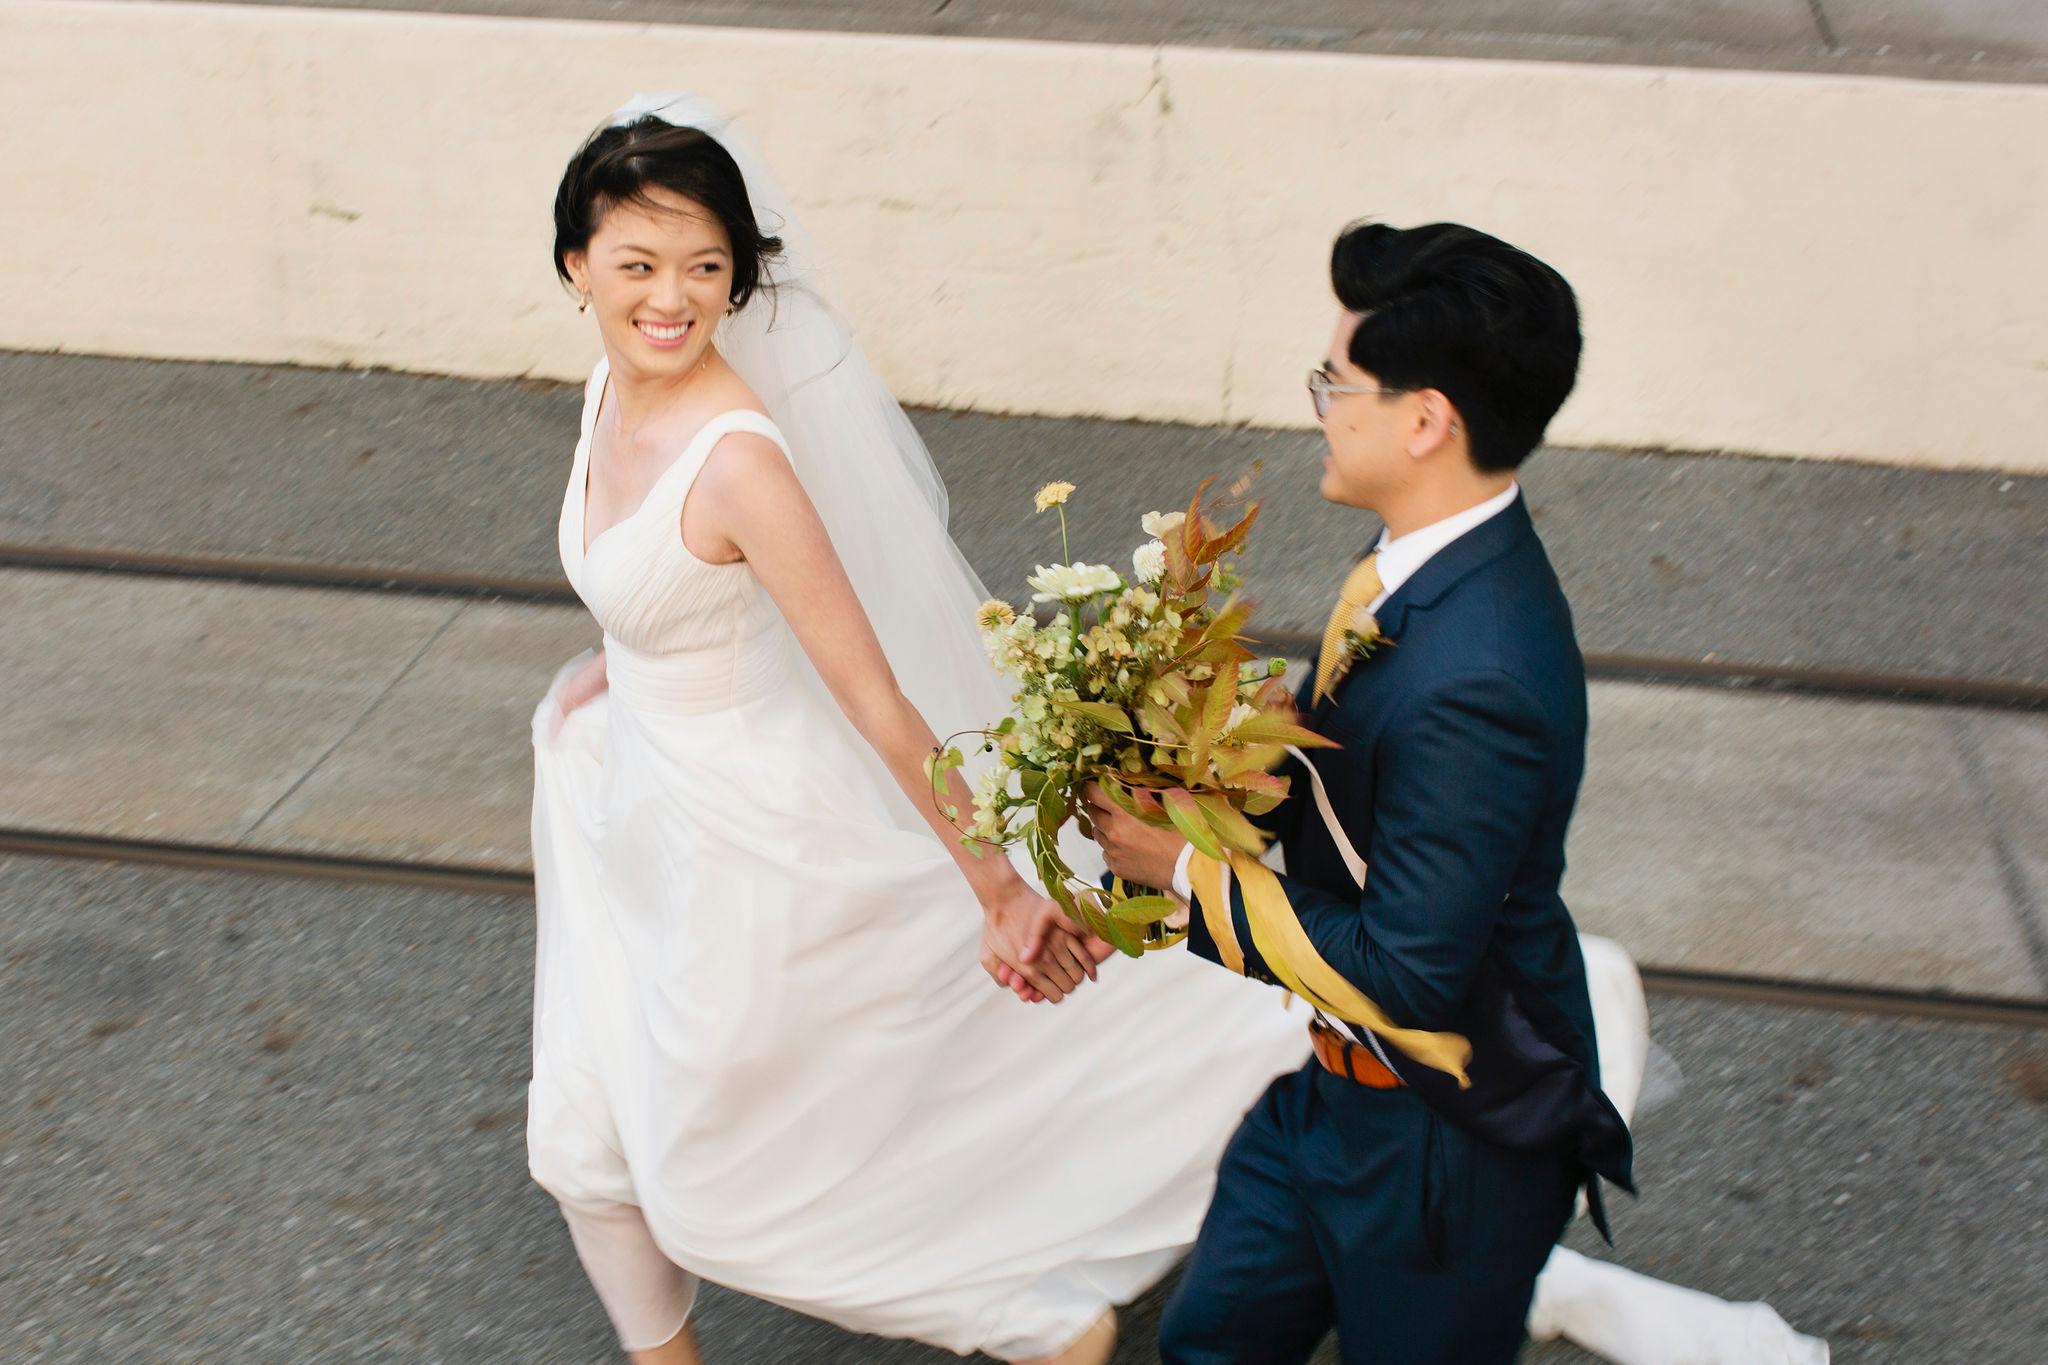 San-Francisco-Wedding-01.JPG